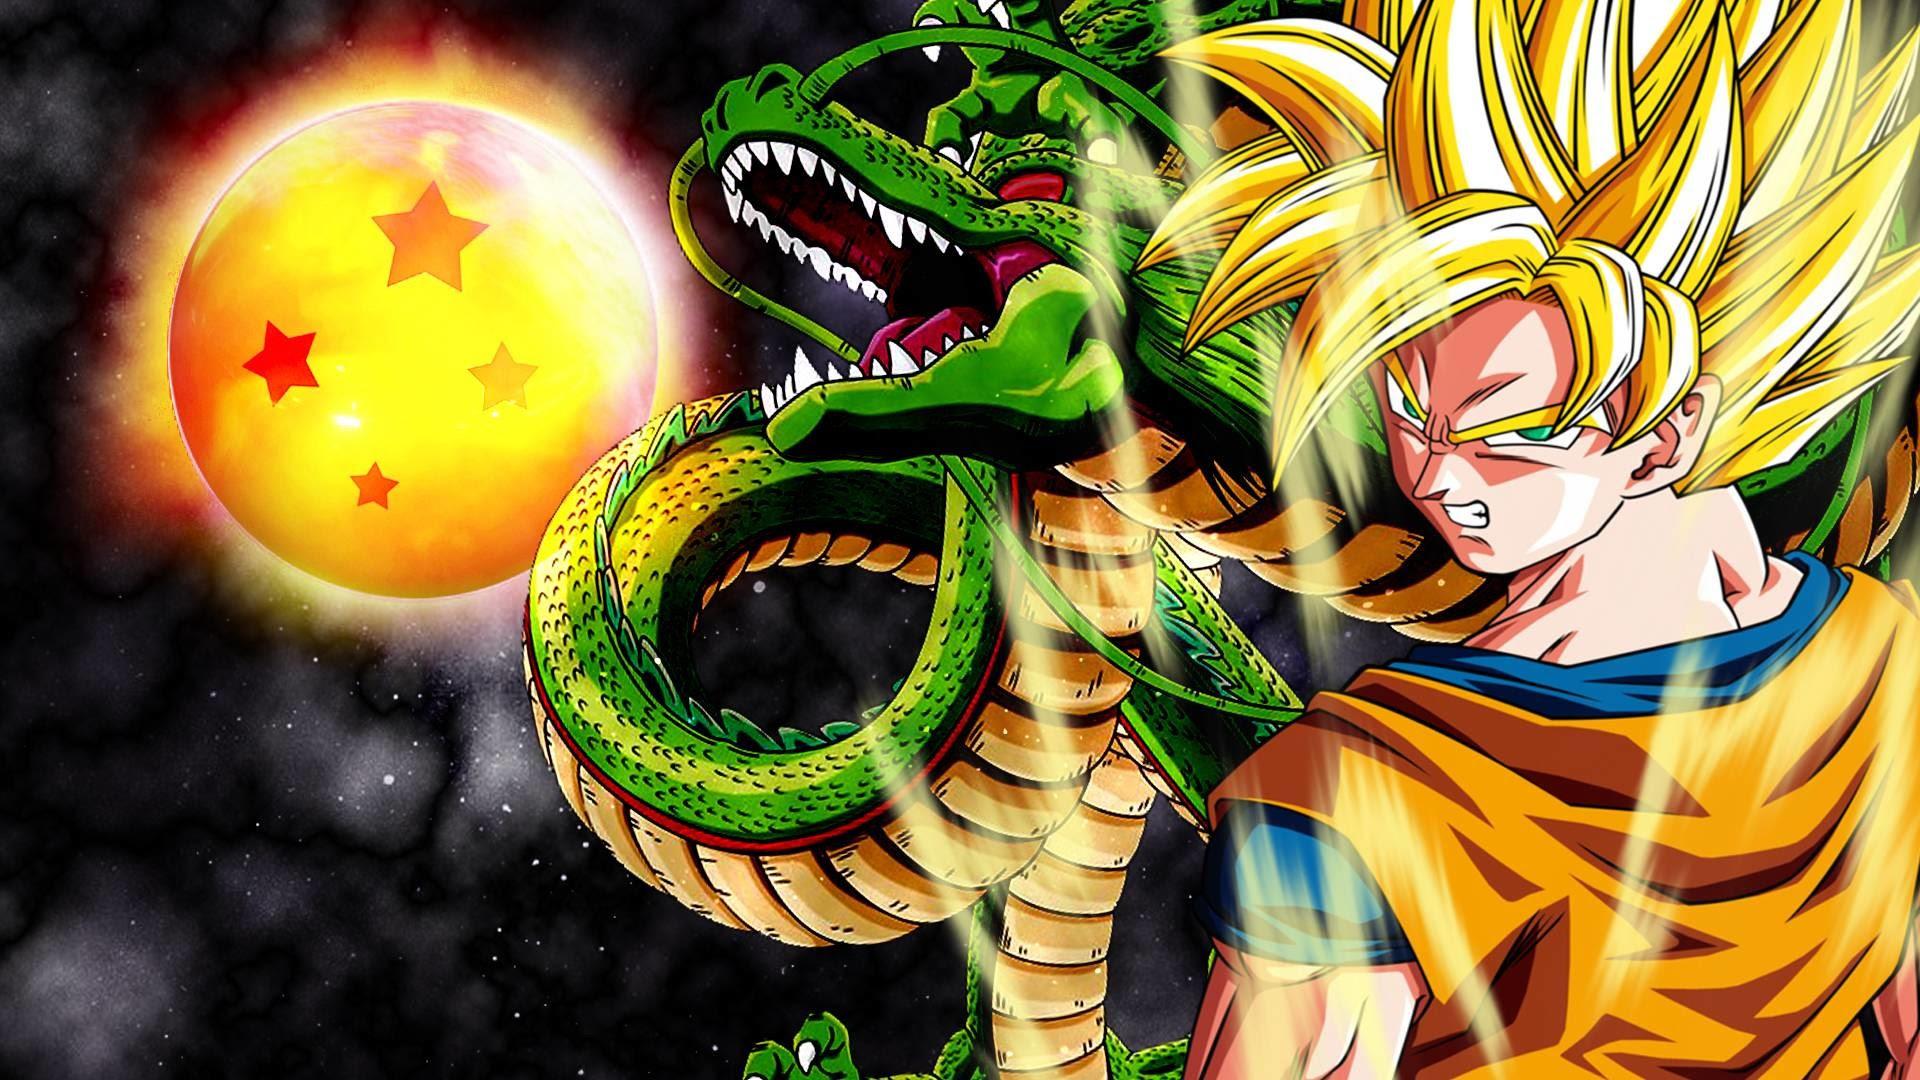 Dragon Ballz Wallpaper 75 Images